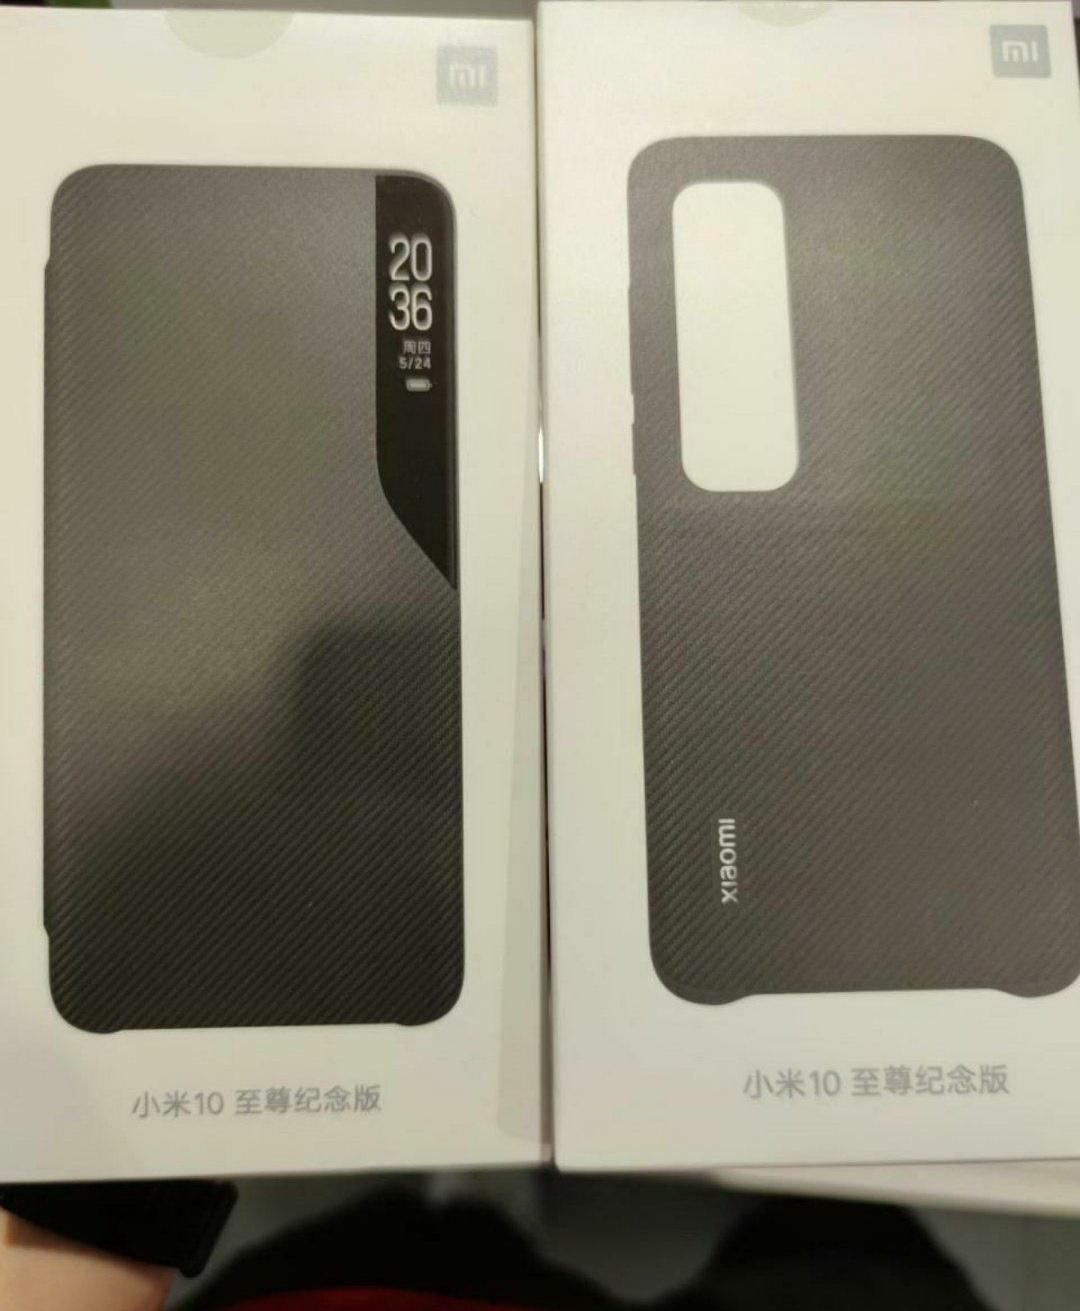 Чехлы для Xiaomi Mi 10 Ultra на фото перед самым анонсом Xiaomi  - gotovye_k_relizy_chehly_dla_xiaomi_mi_10_ultra_na_foto_pered_anonsom_picture2_0